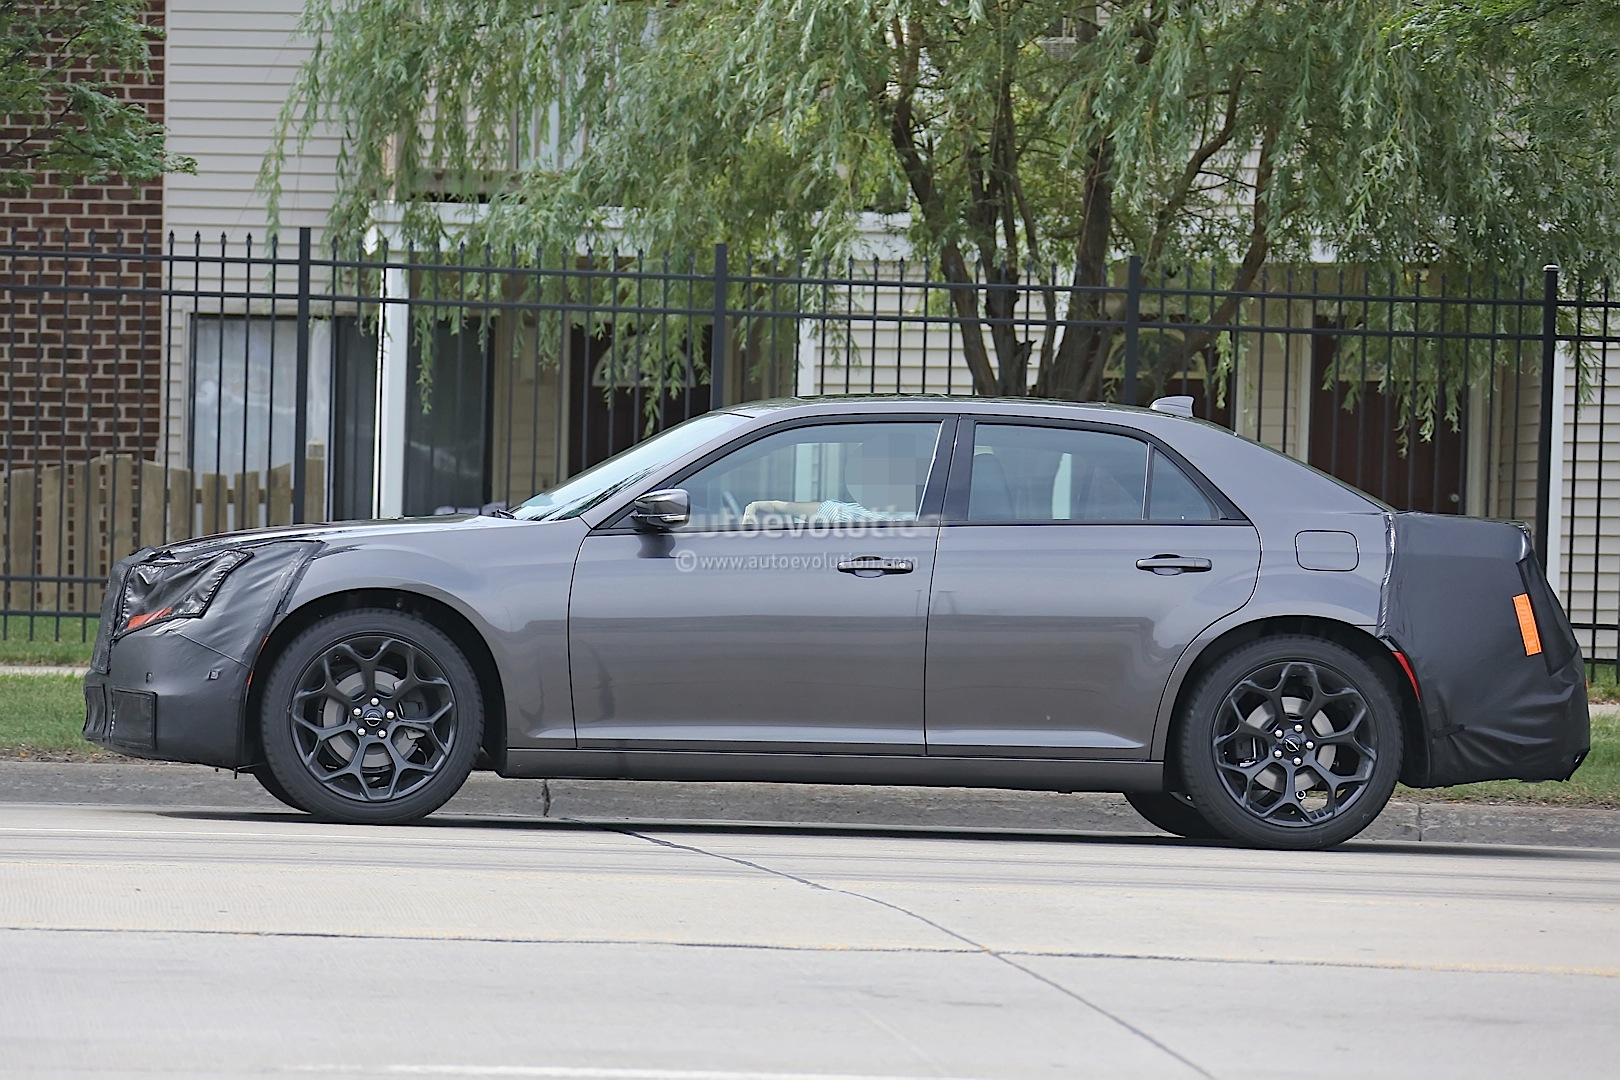 2015 Chrysler 300 32 Free Hd Car Wallpaper